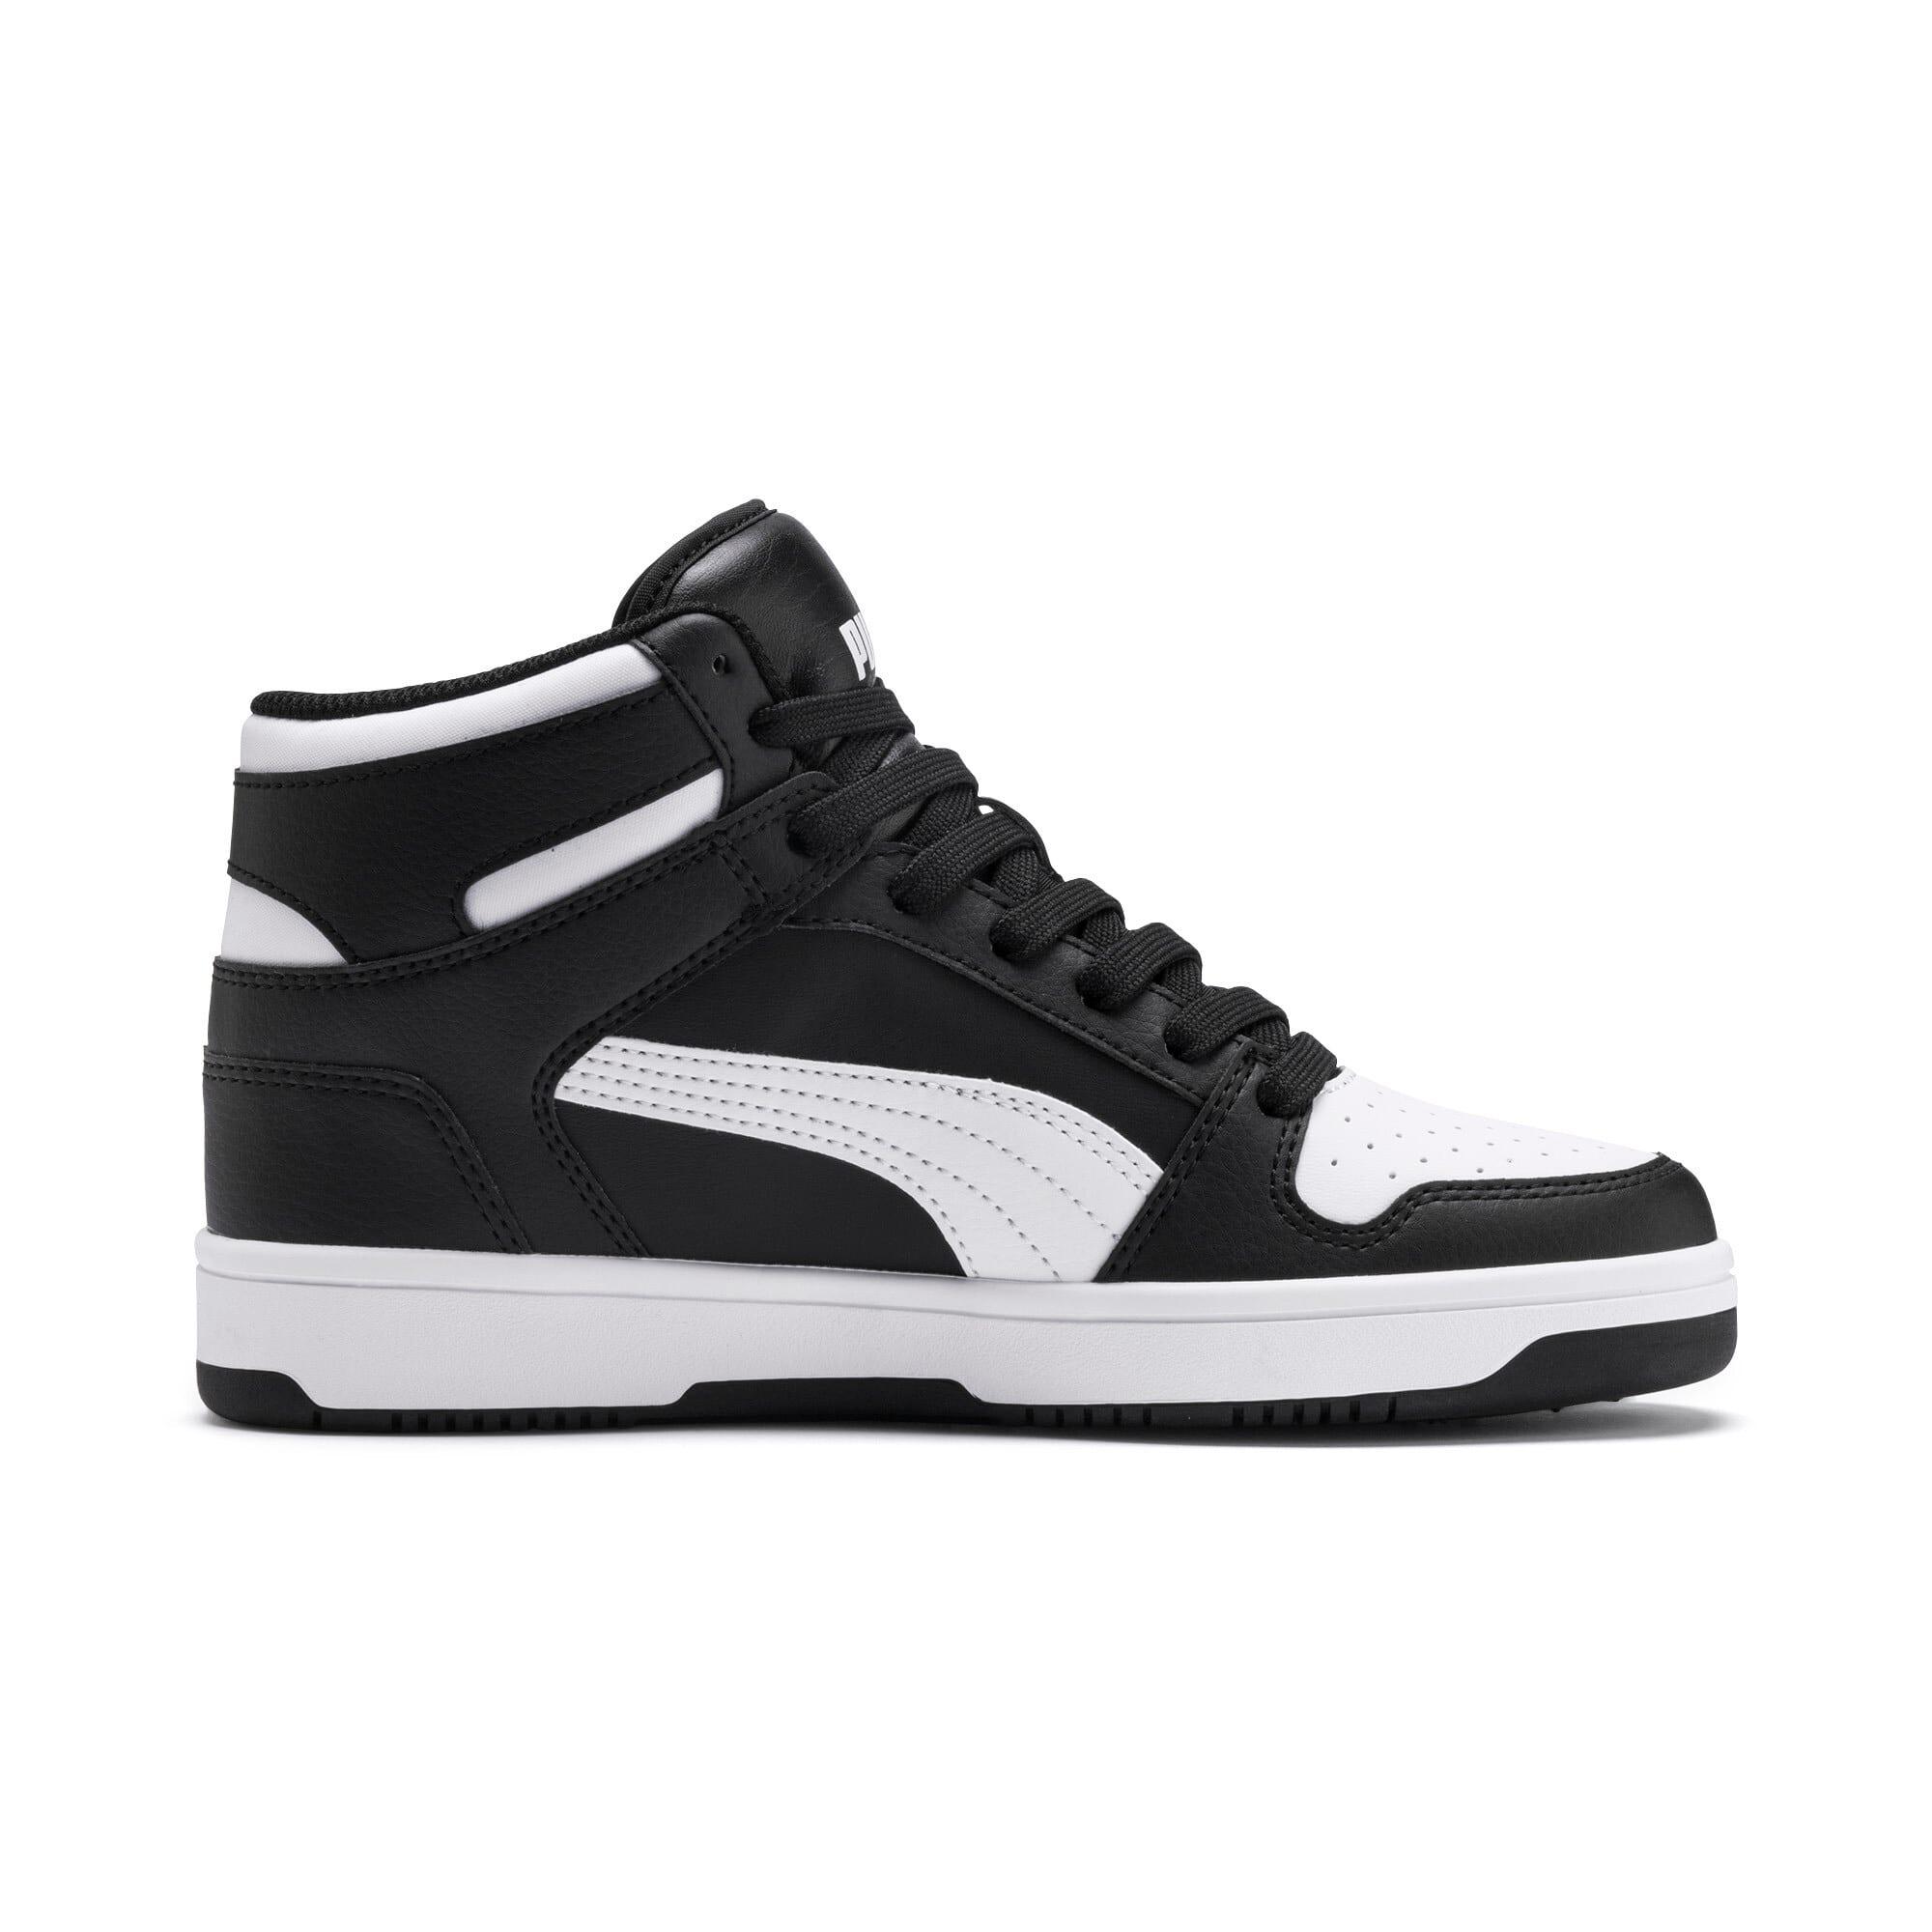 Thumbnail 5 of PUMA Rebound LayUp Mid Sneakers JR, Puma Black-Puma White, medium